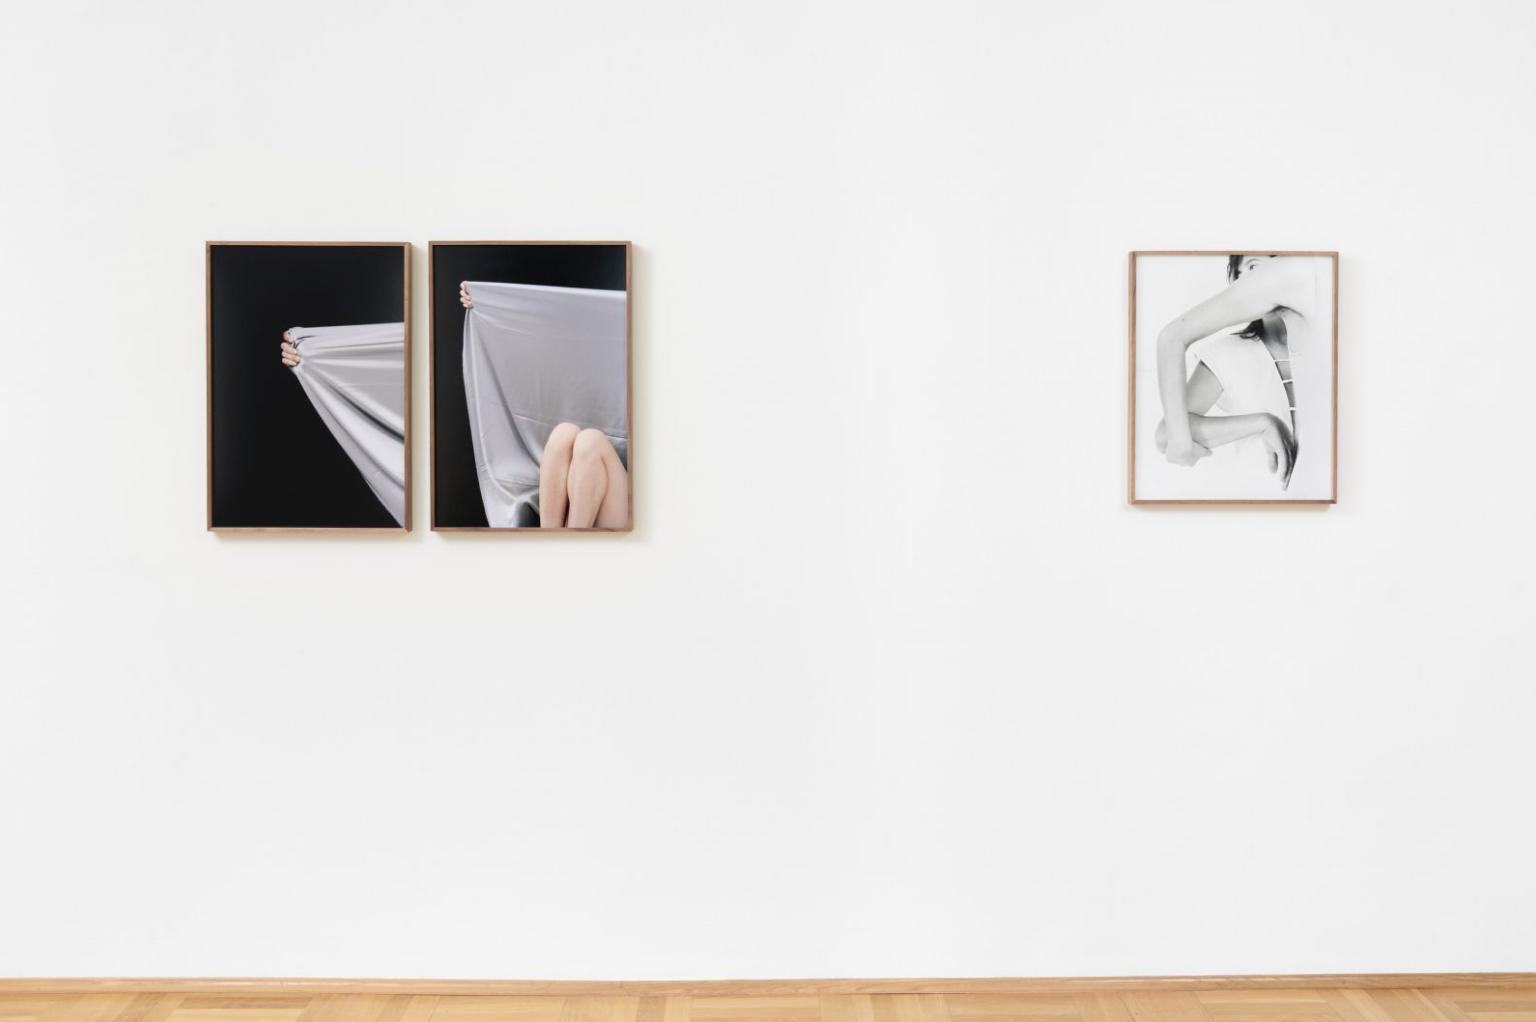 Premio VBKI 2019 de arte emergente – Schwarz Contemporary & Jenna Westra